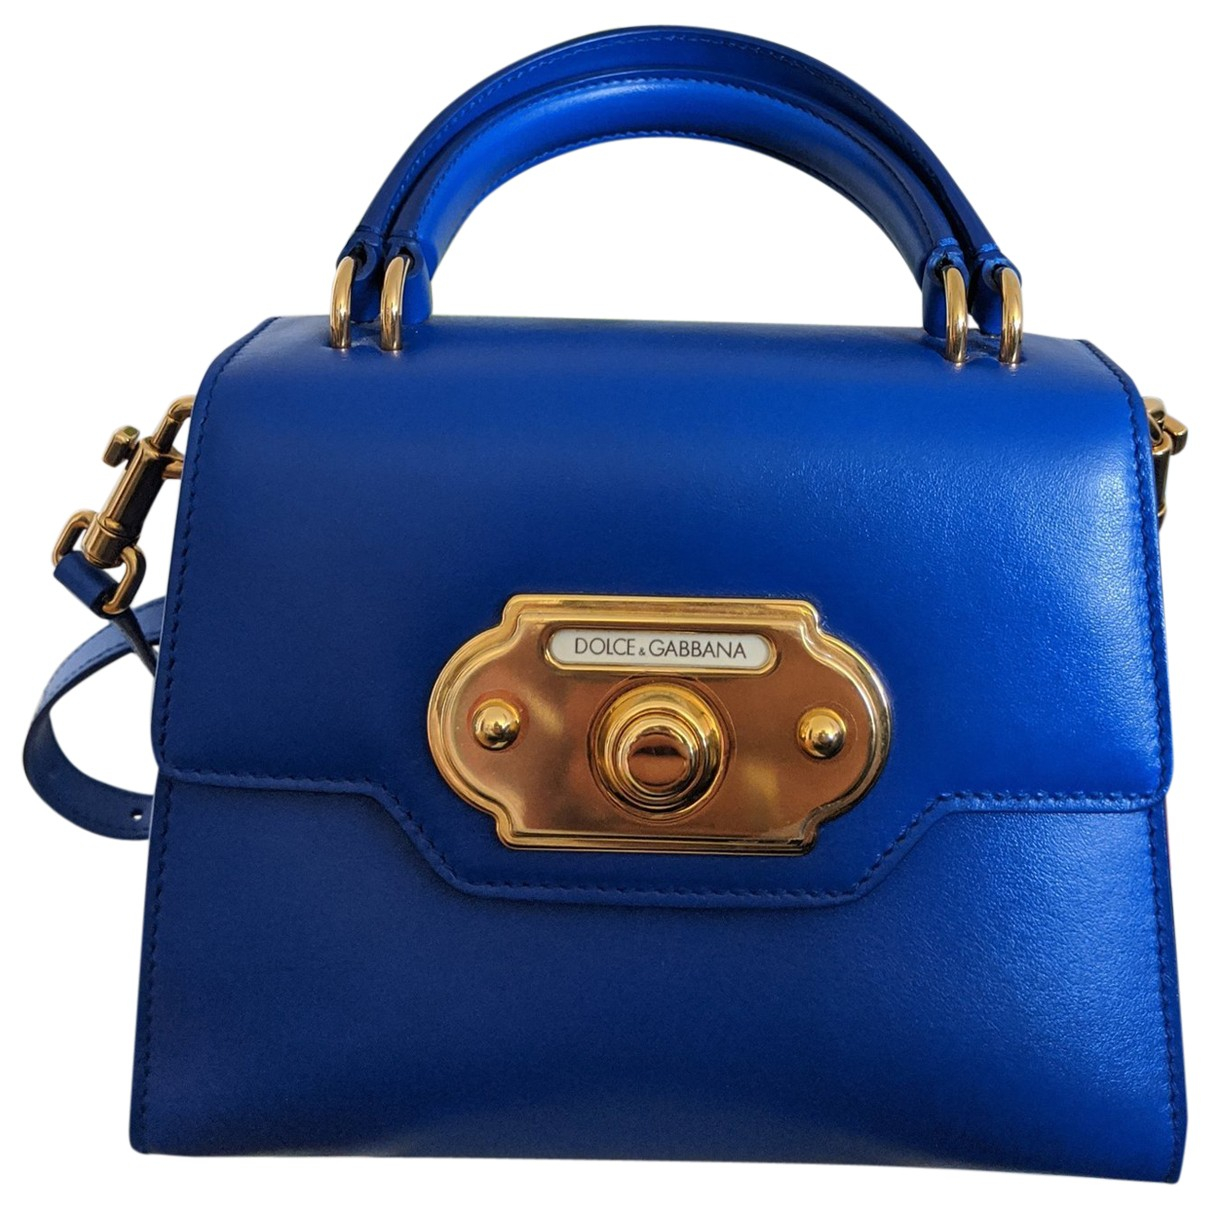 Dolce & Gabbana - Sac a main Welcome pour femme en cuir - bleu